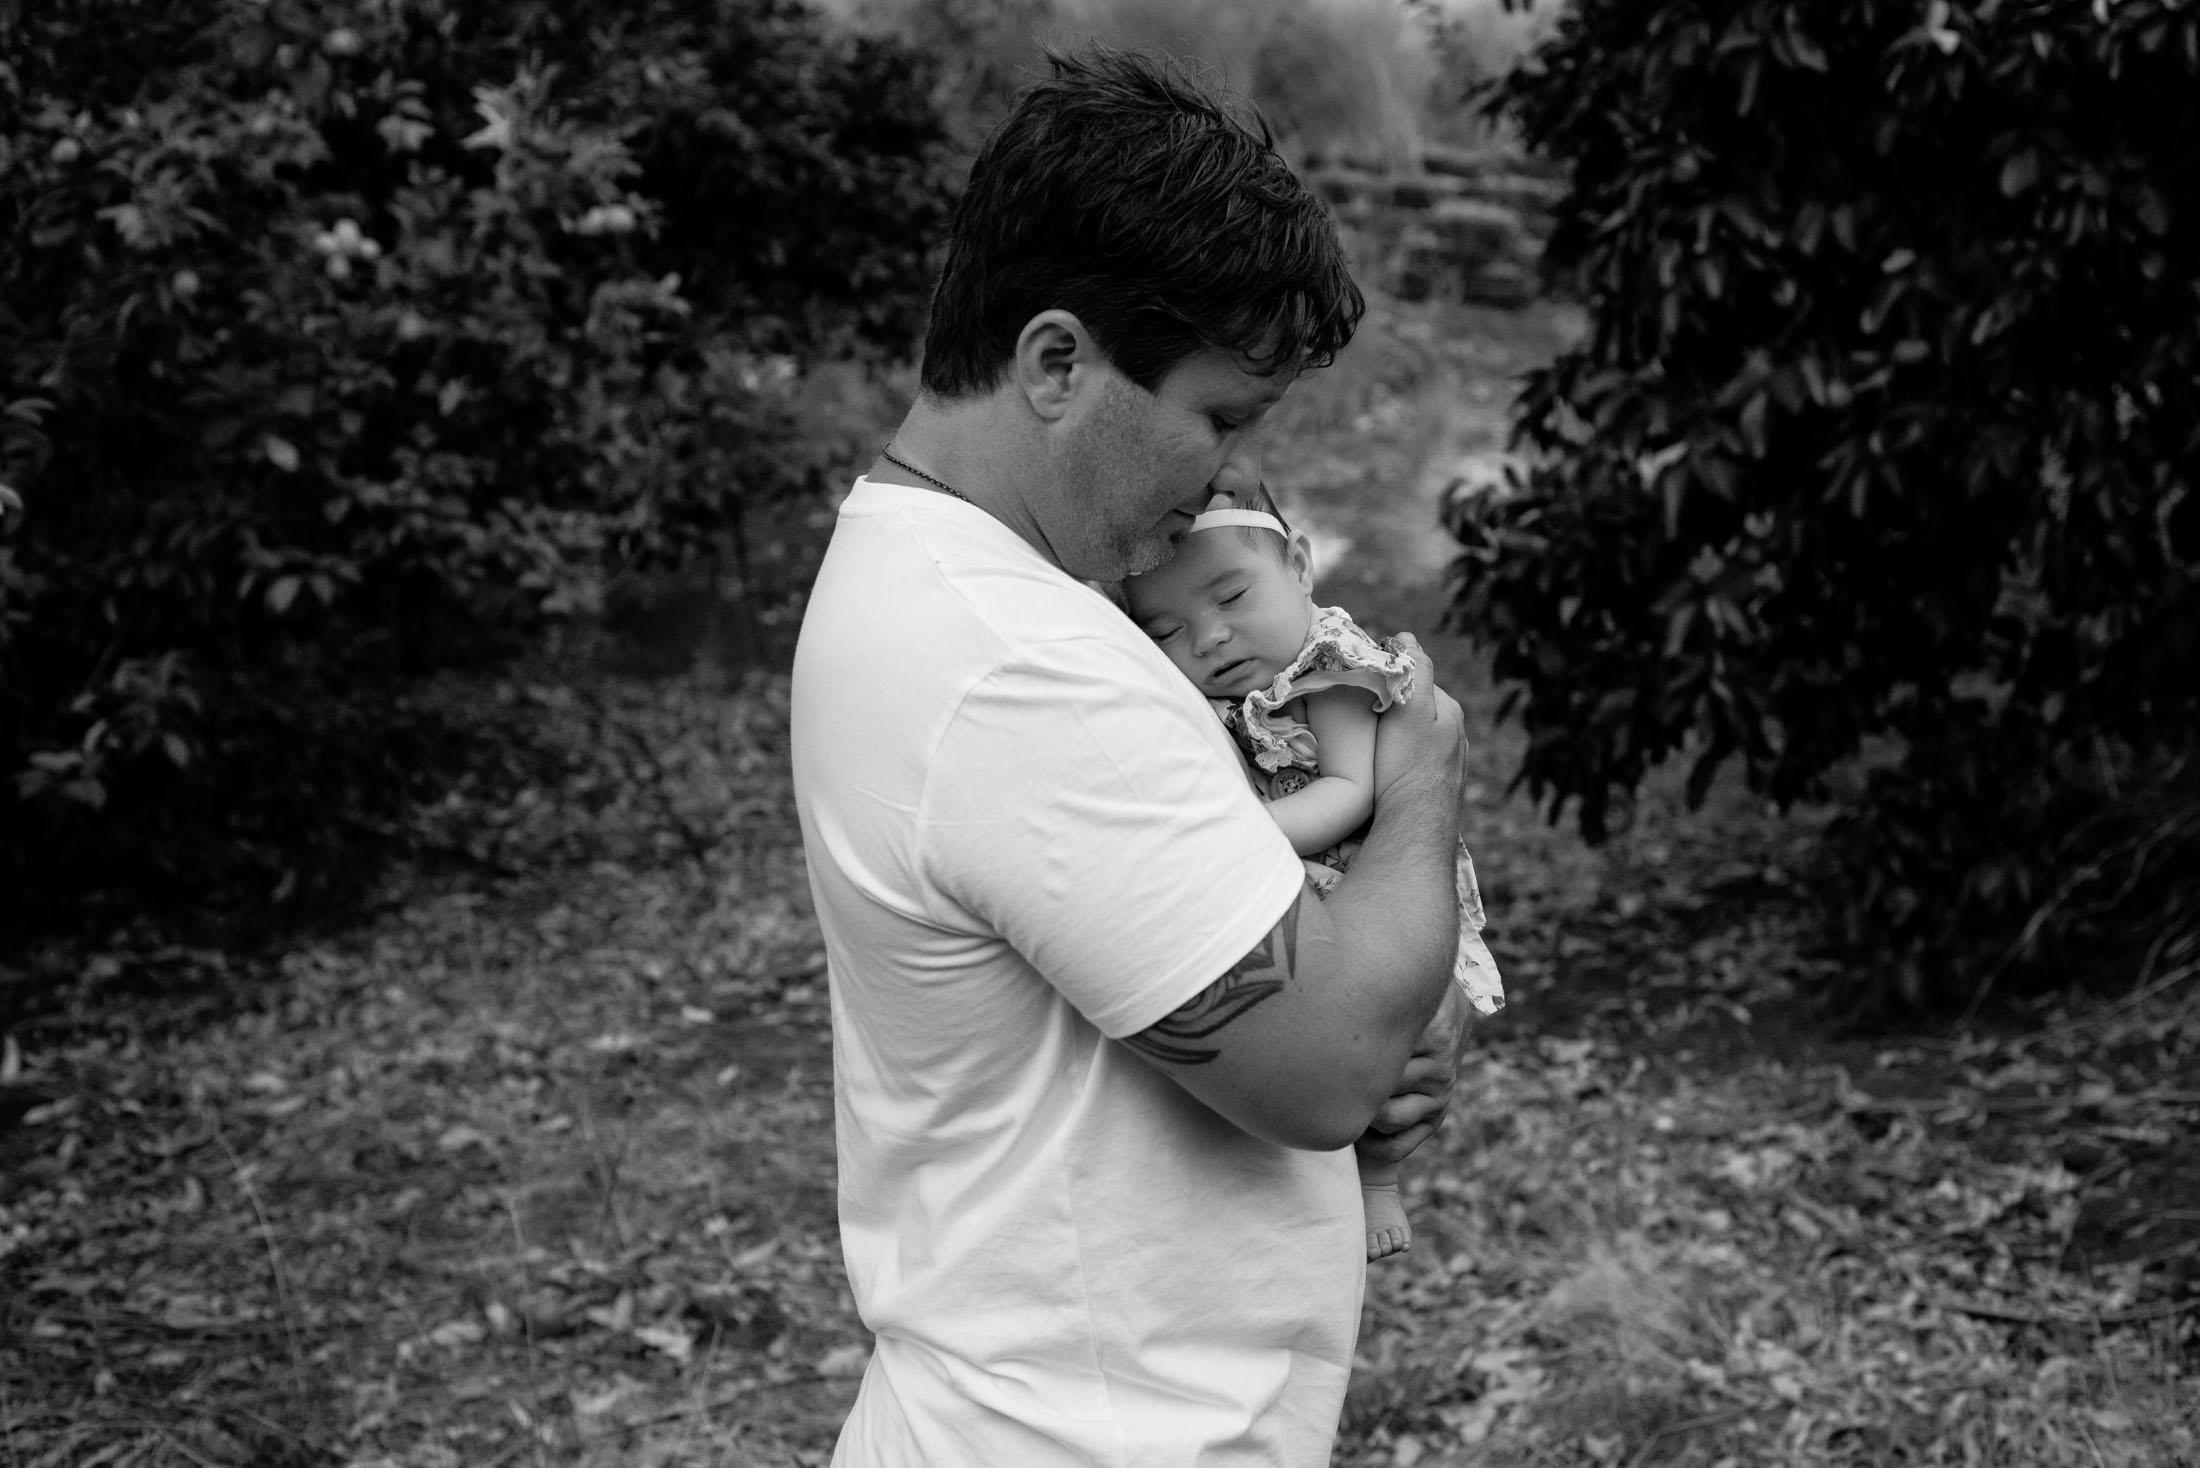 Popa_Family-Photography-unposed17.JPG